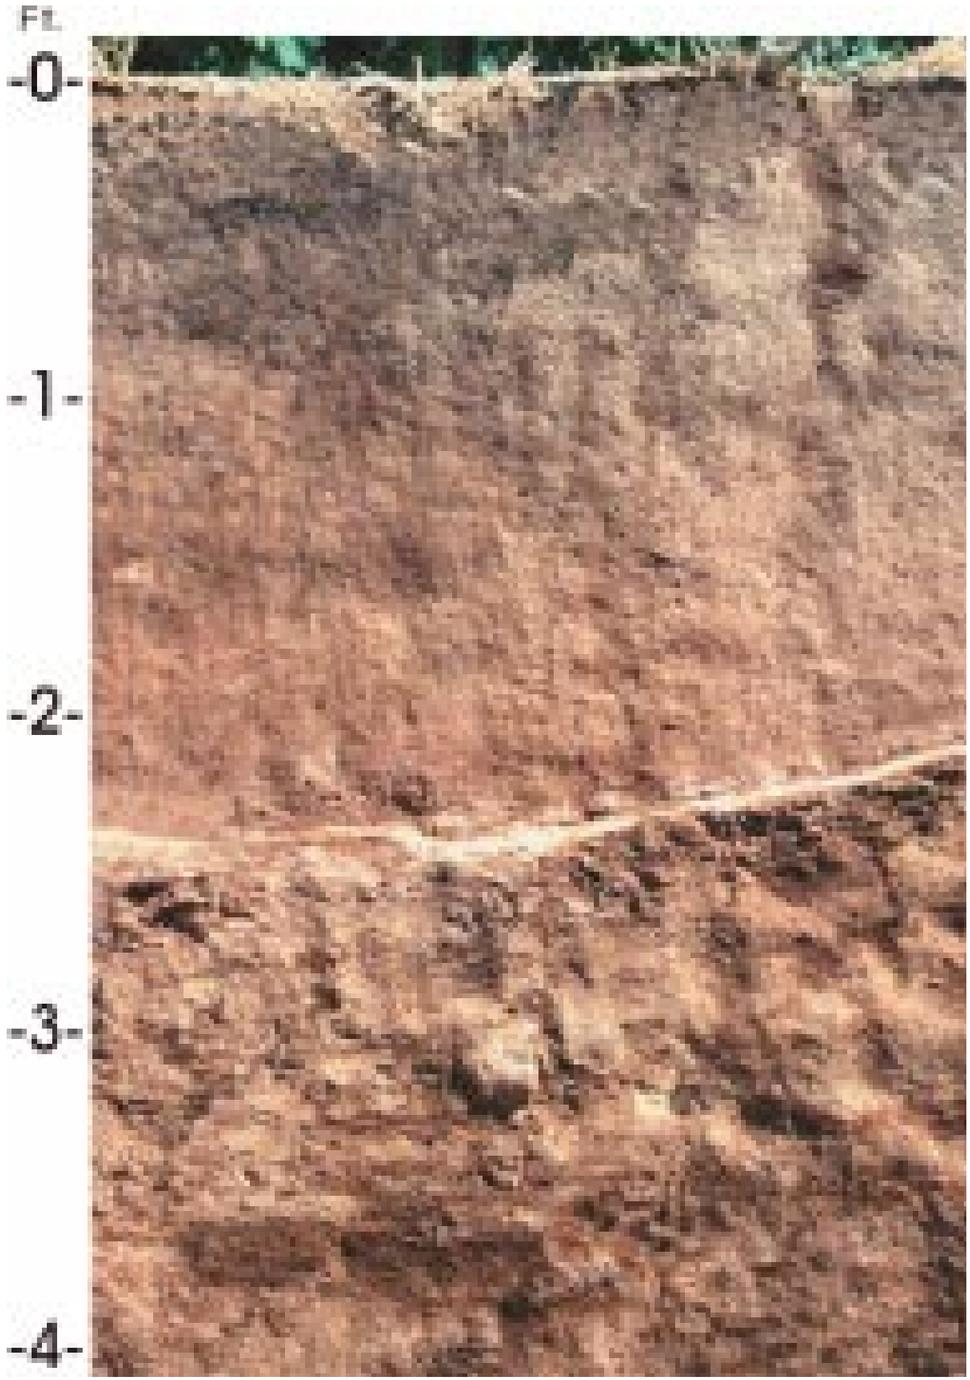 San Joaquin soil profile